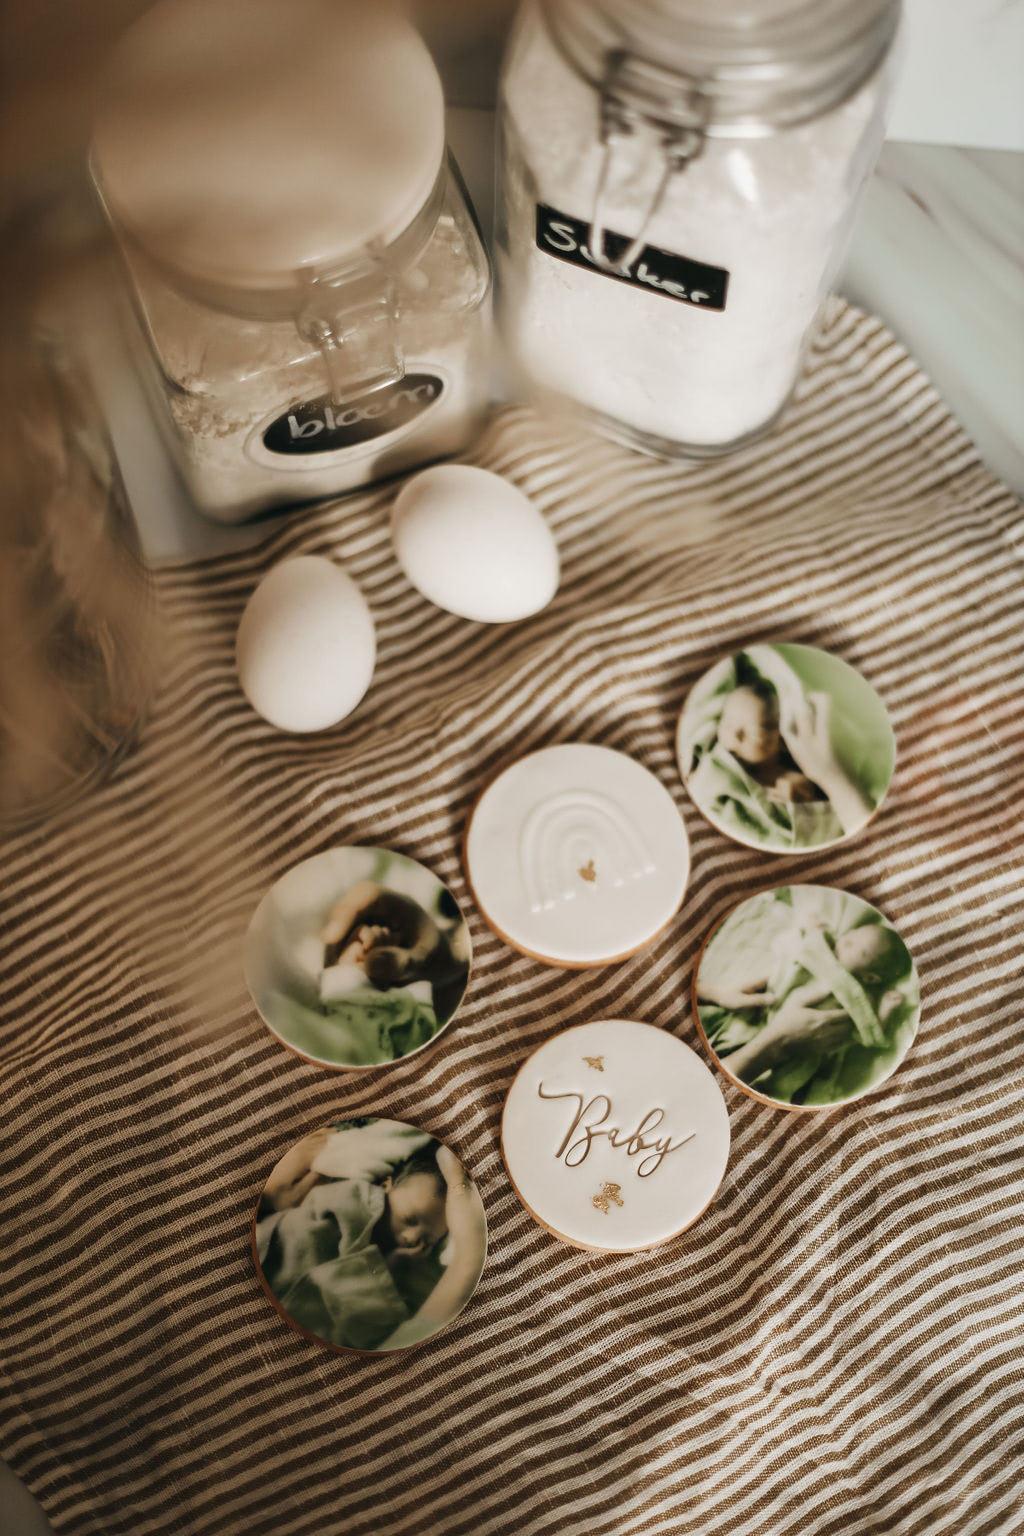 Gepersonaliseerde koekjes van Cookie Doos - Loraine van Niekerk